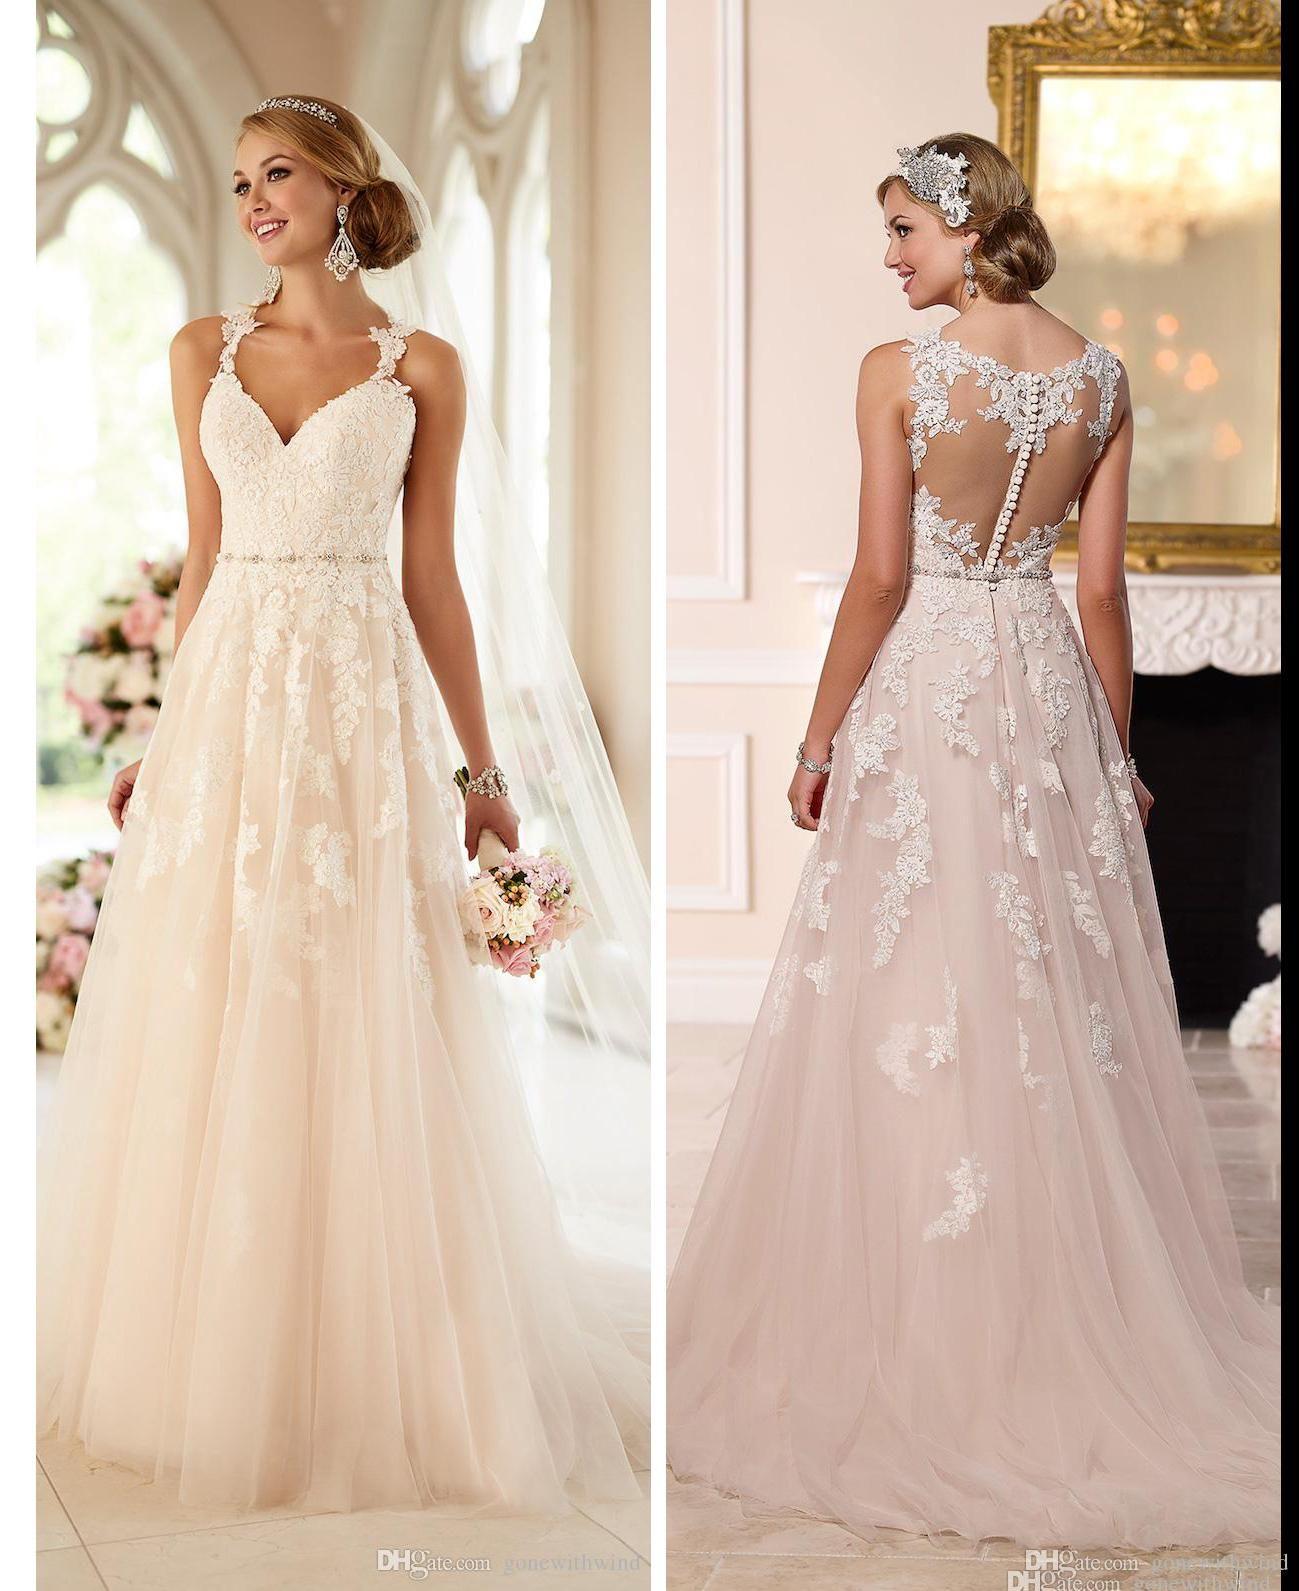 Blush Pink Lace Wedding Dresses  Stella York Romantic Wedding